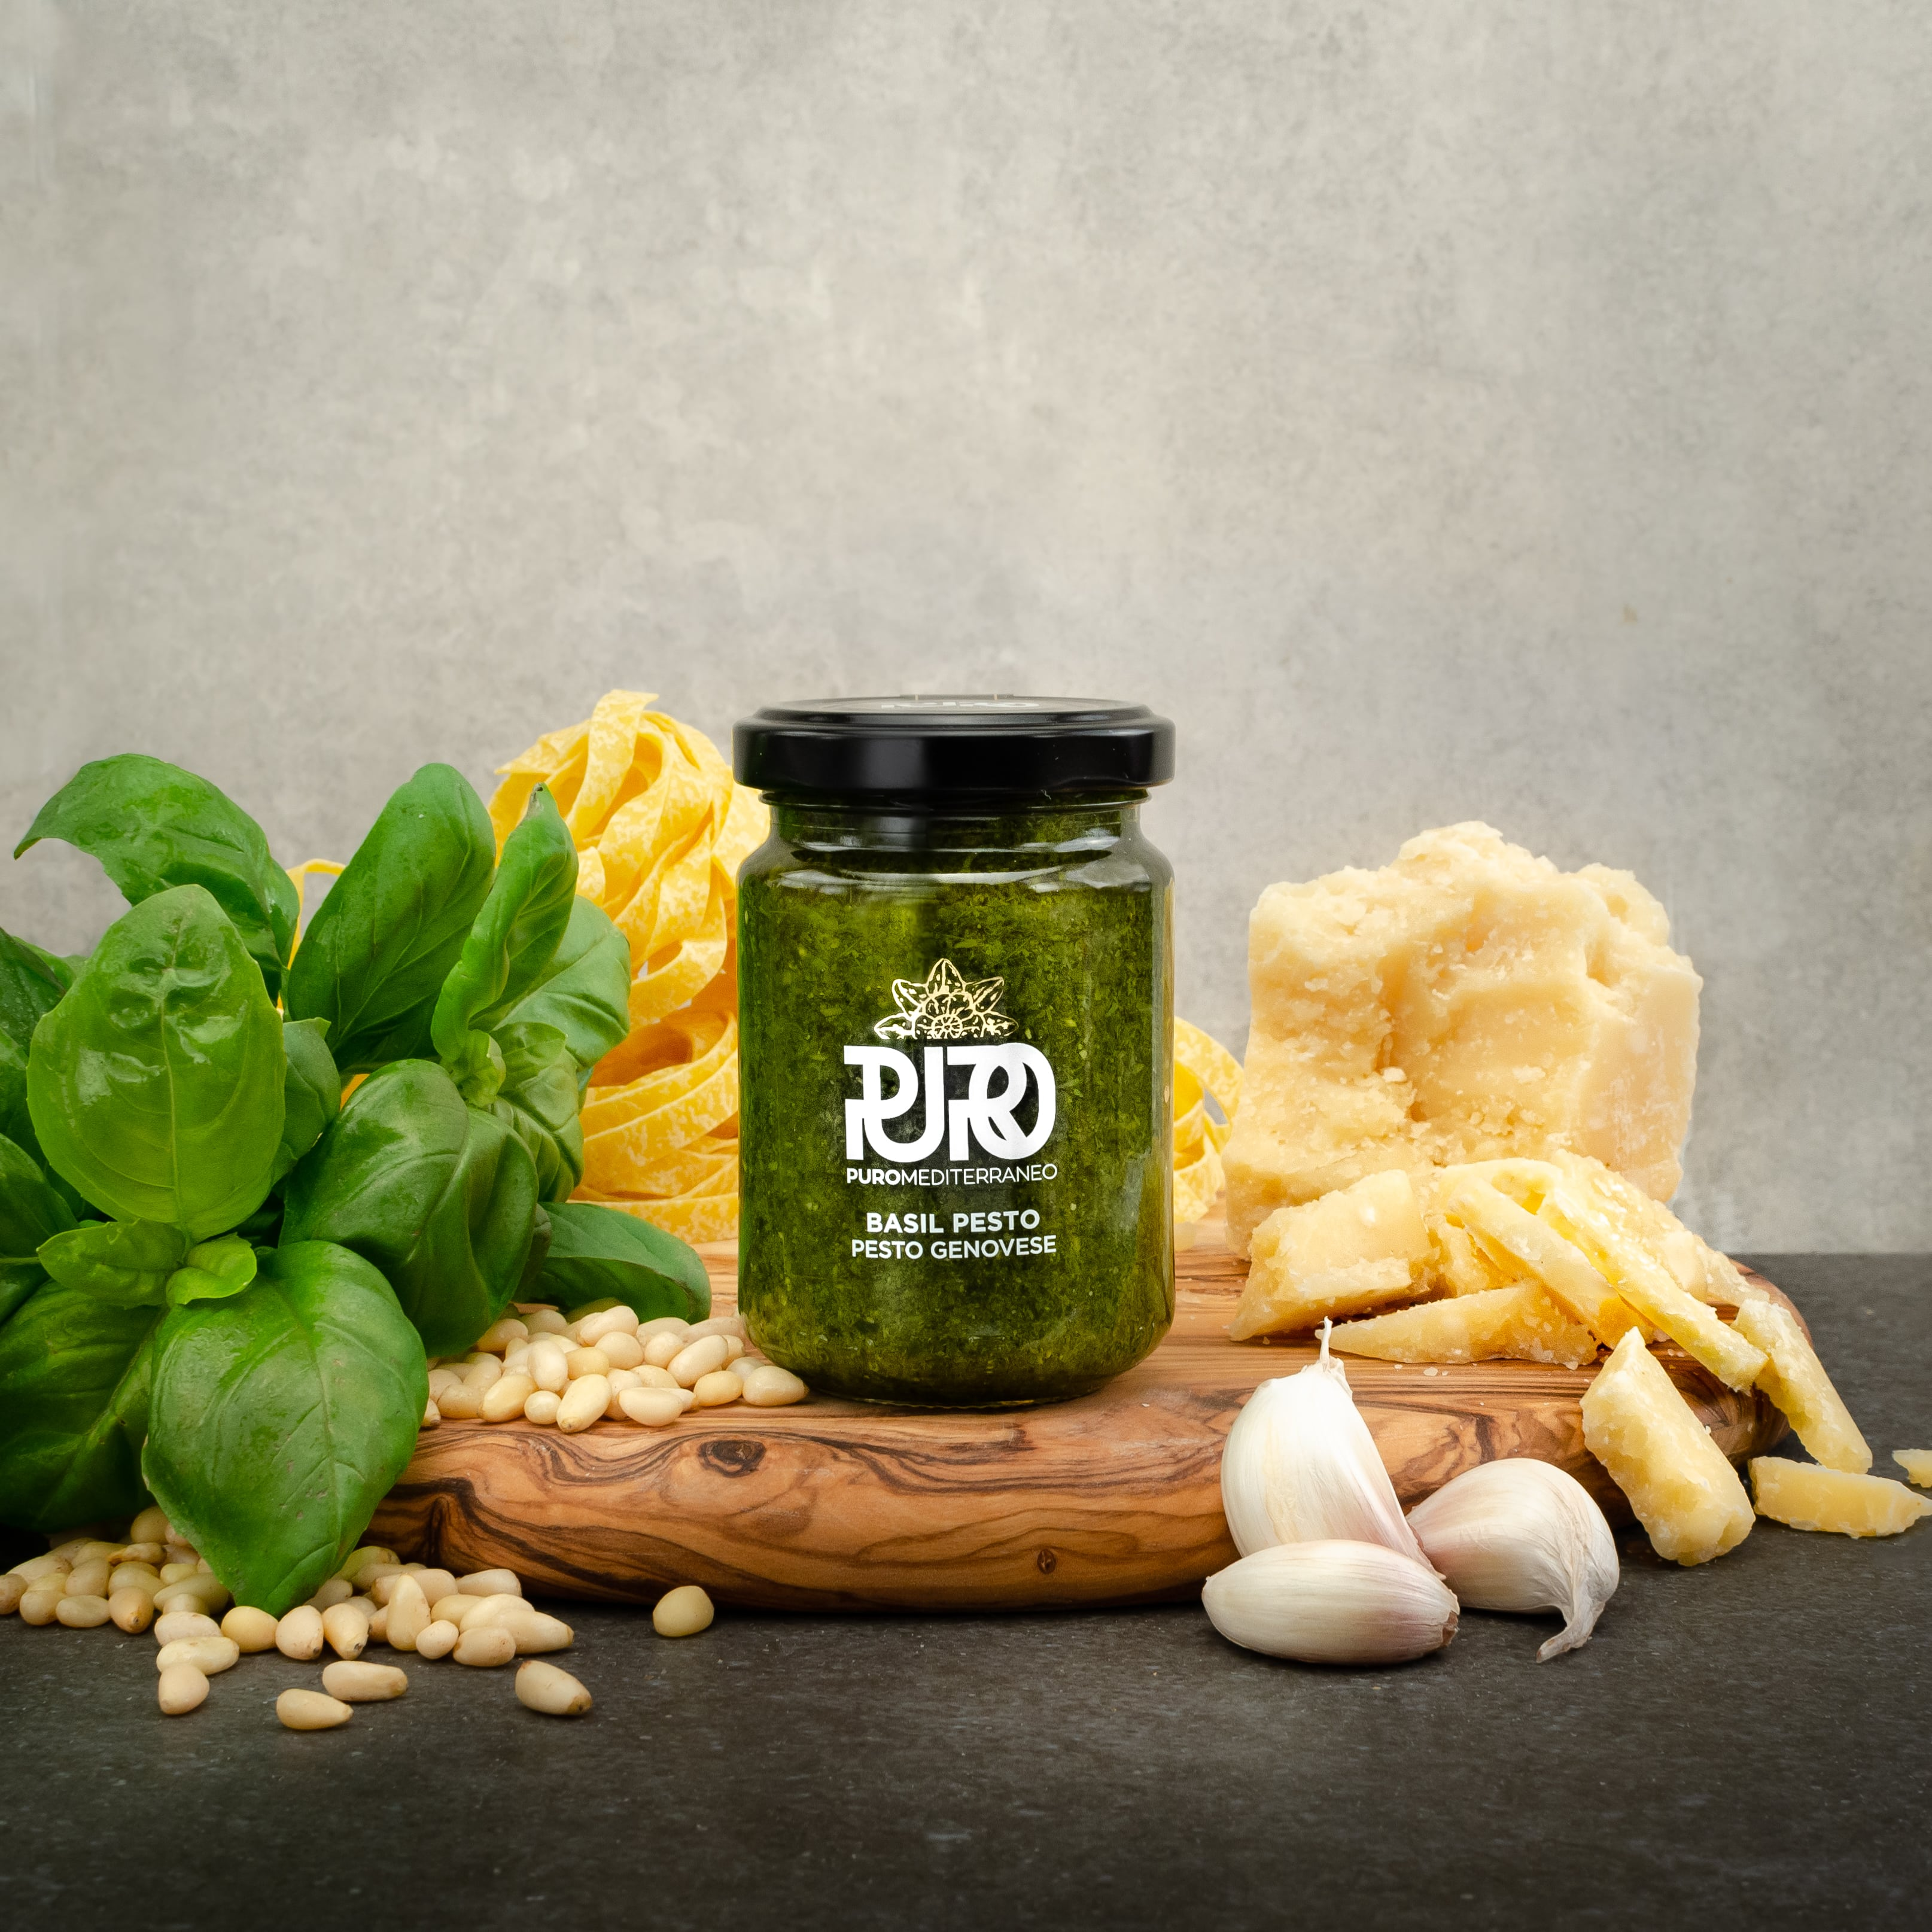 Puro Mediterraneo Raw Basil Pesto